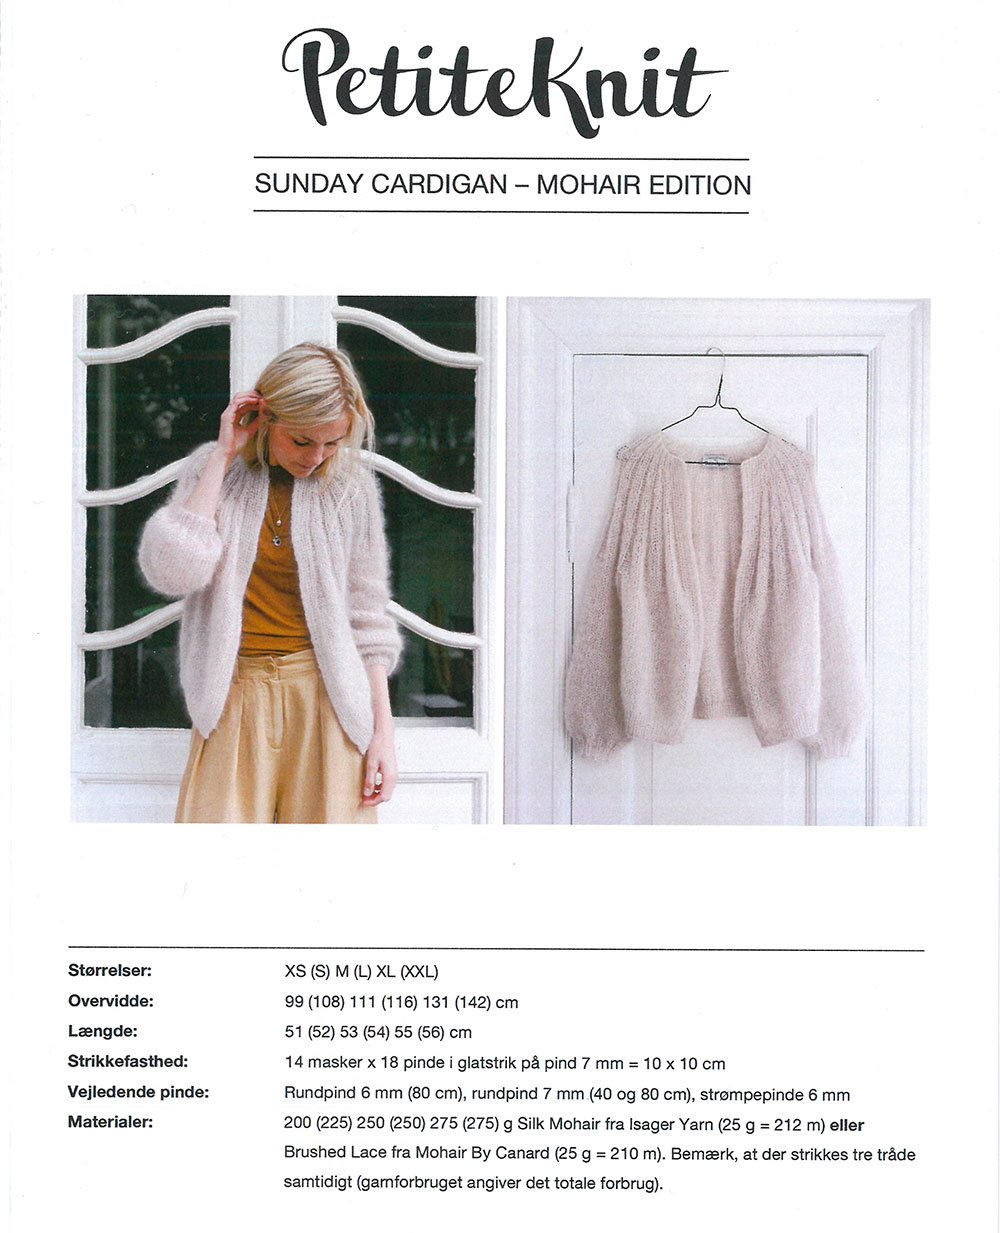 Sunday Cardigan pattern by PetiteKnit